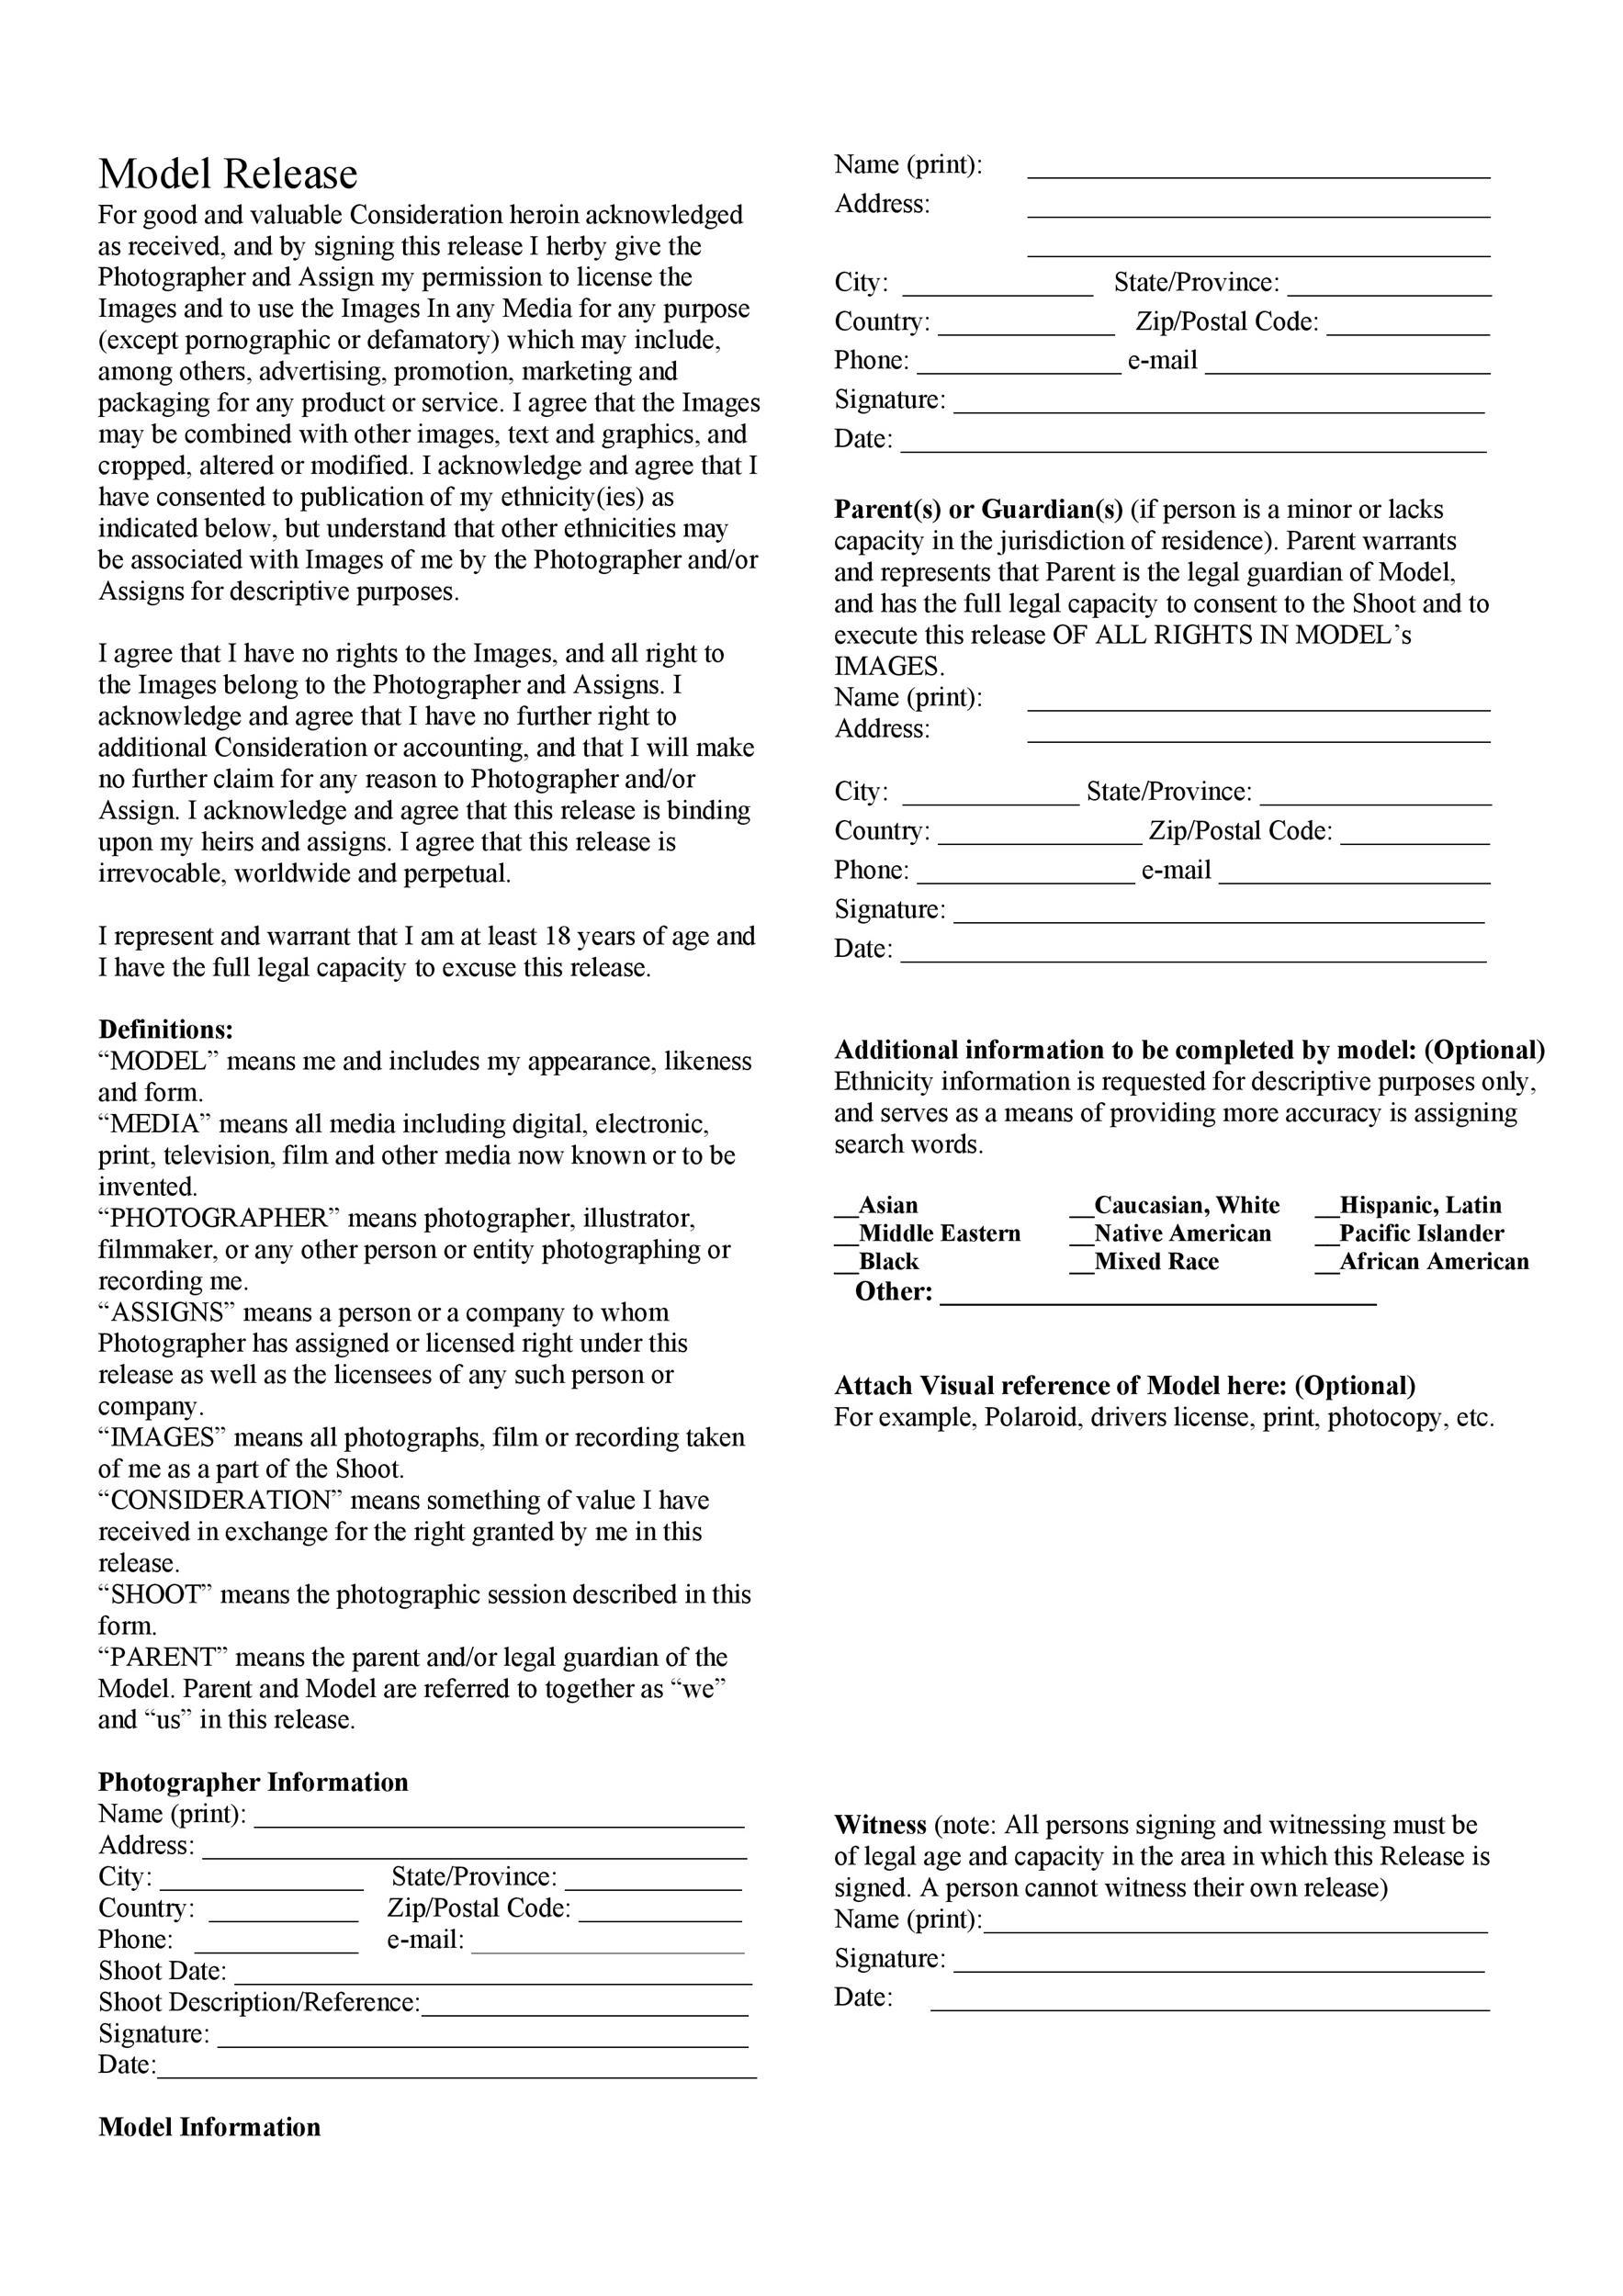 Free model release form 47